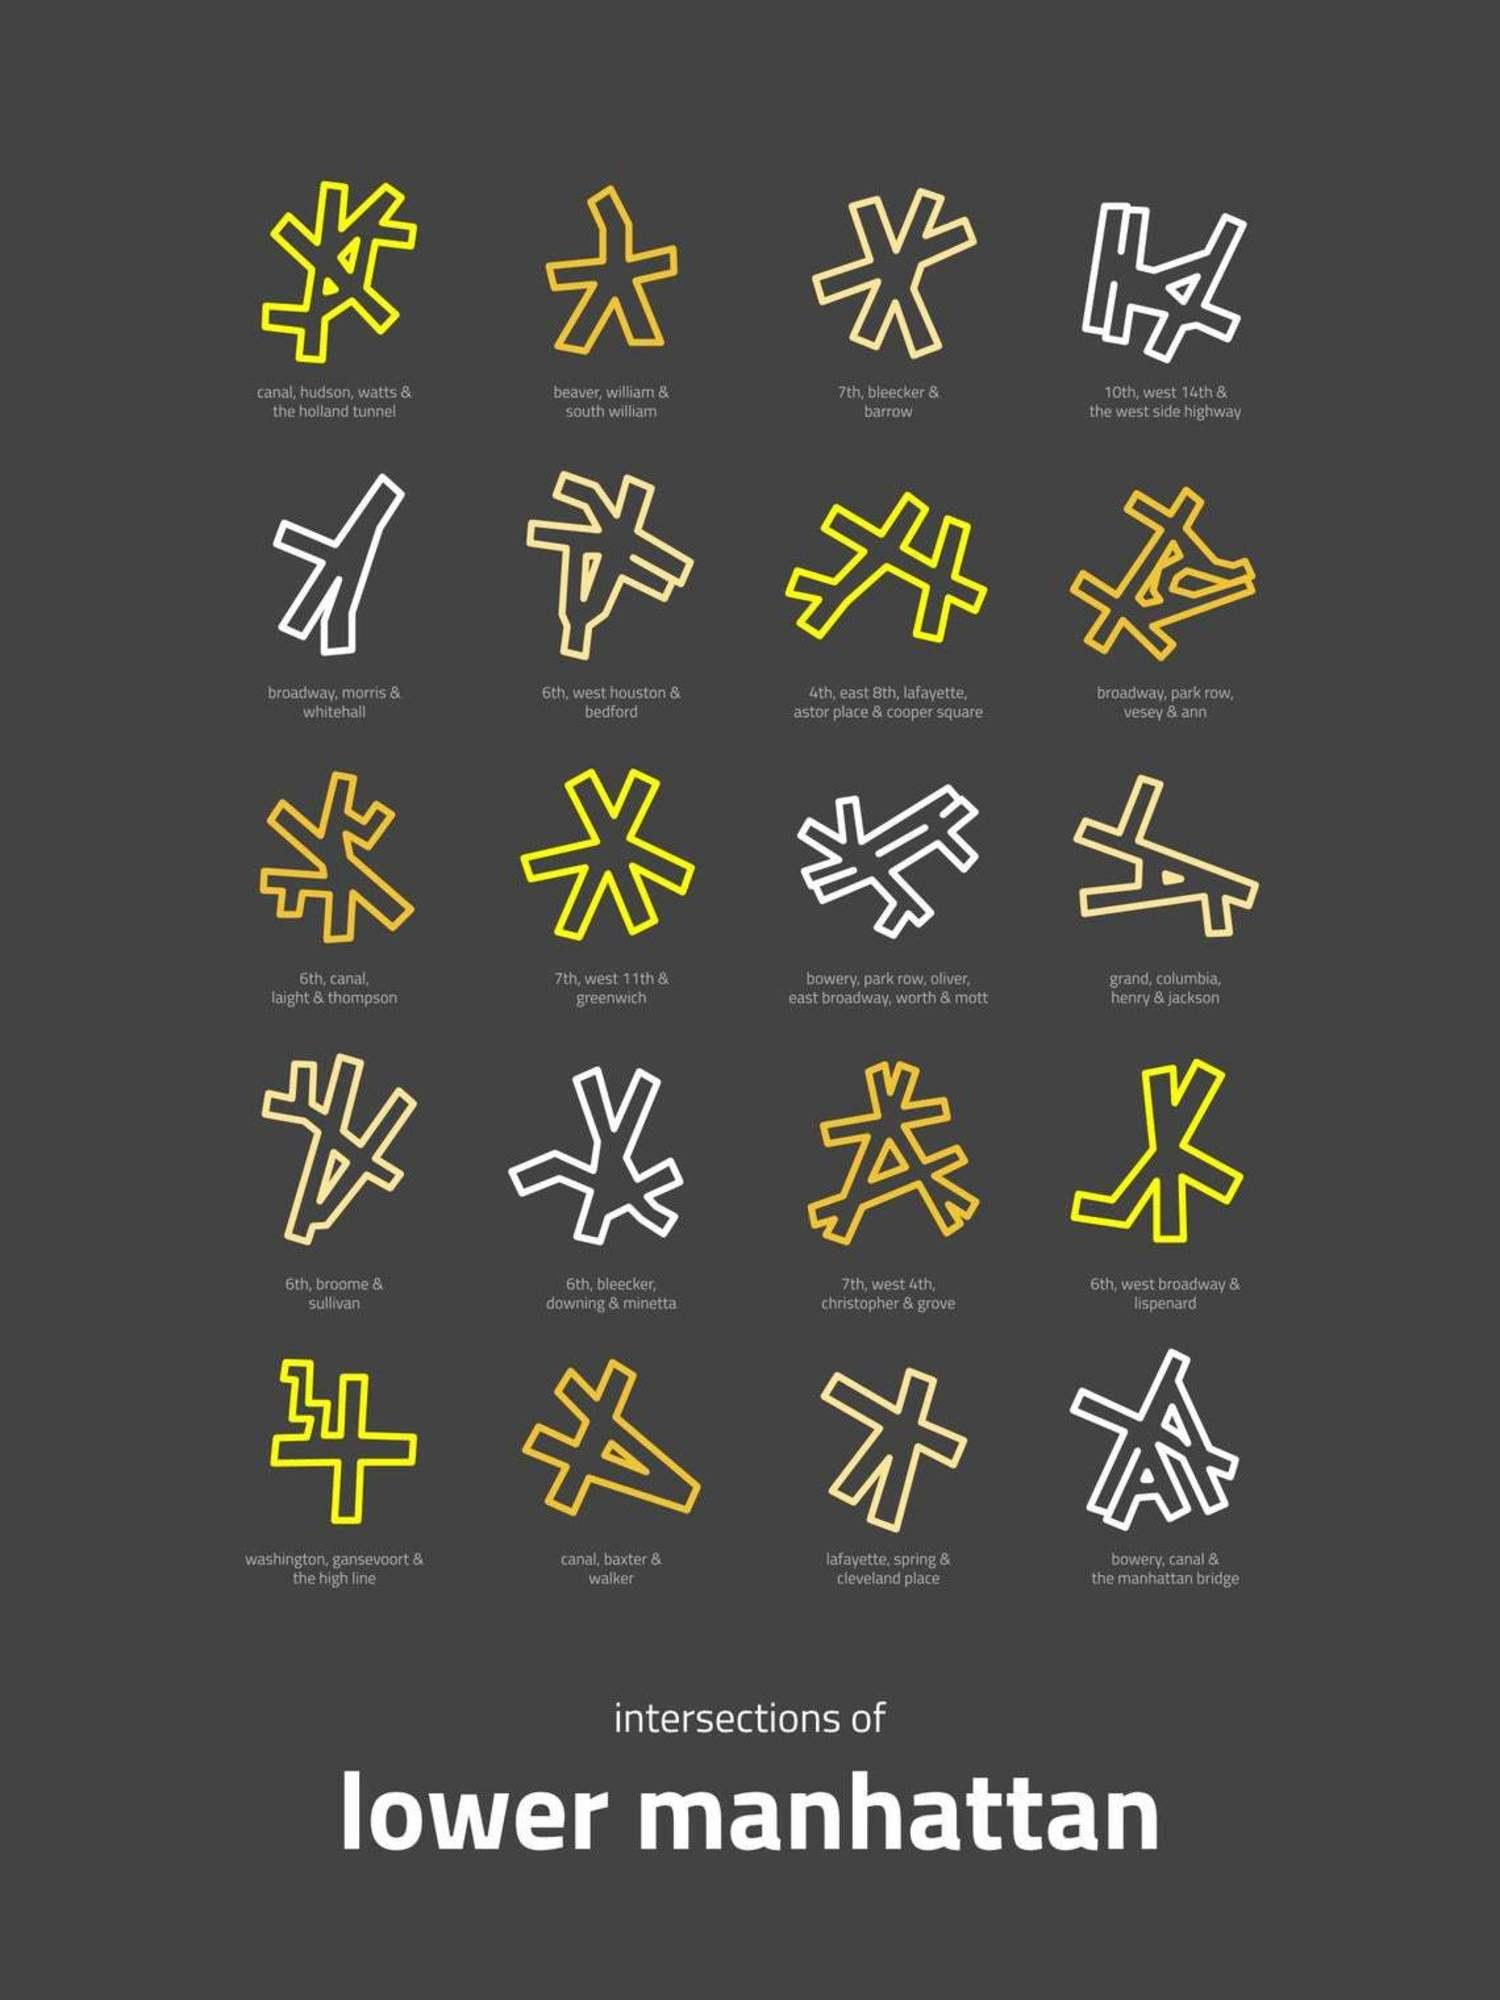 Manhattan Intersections